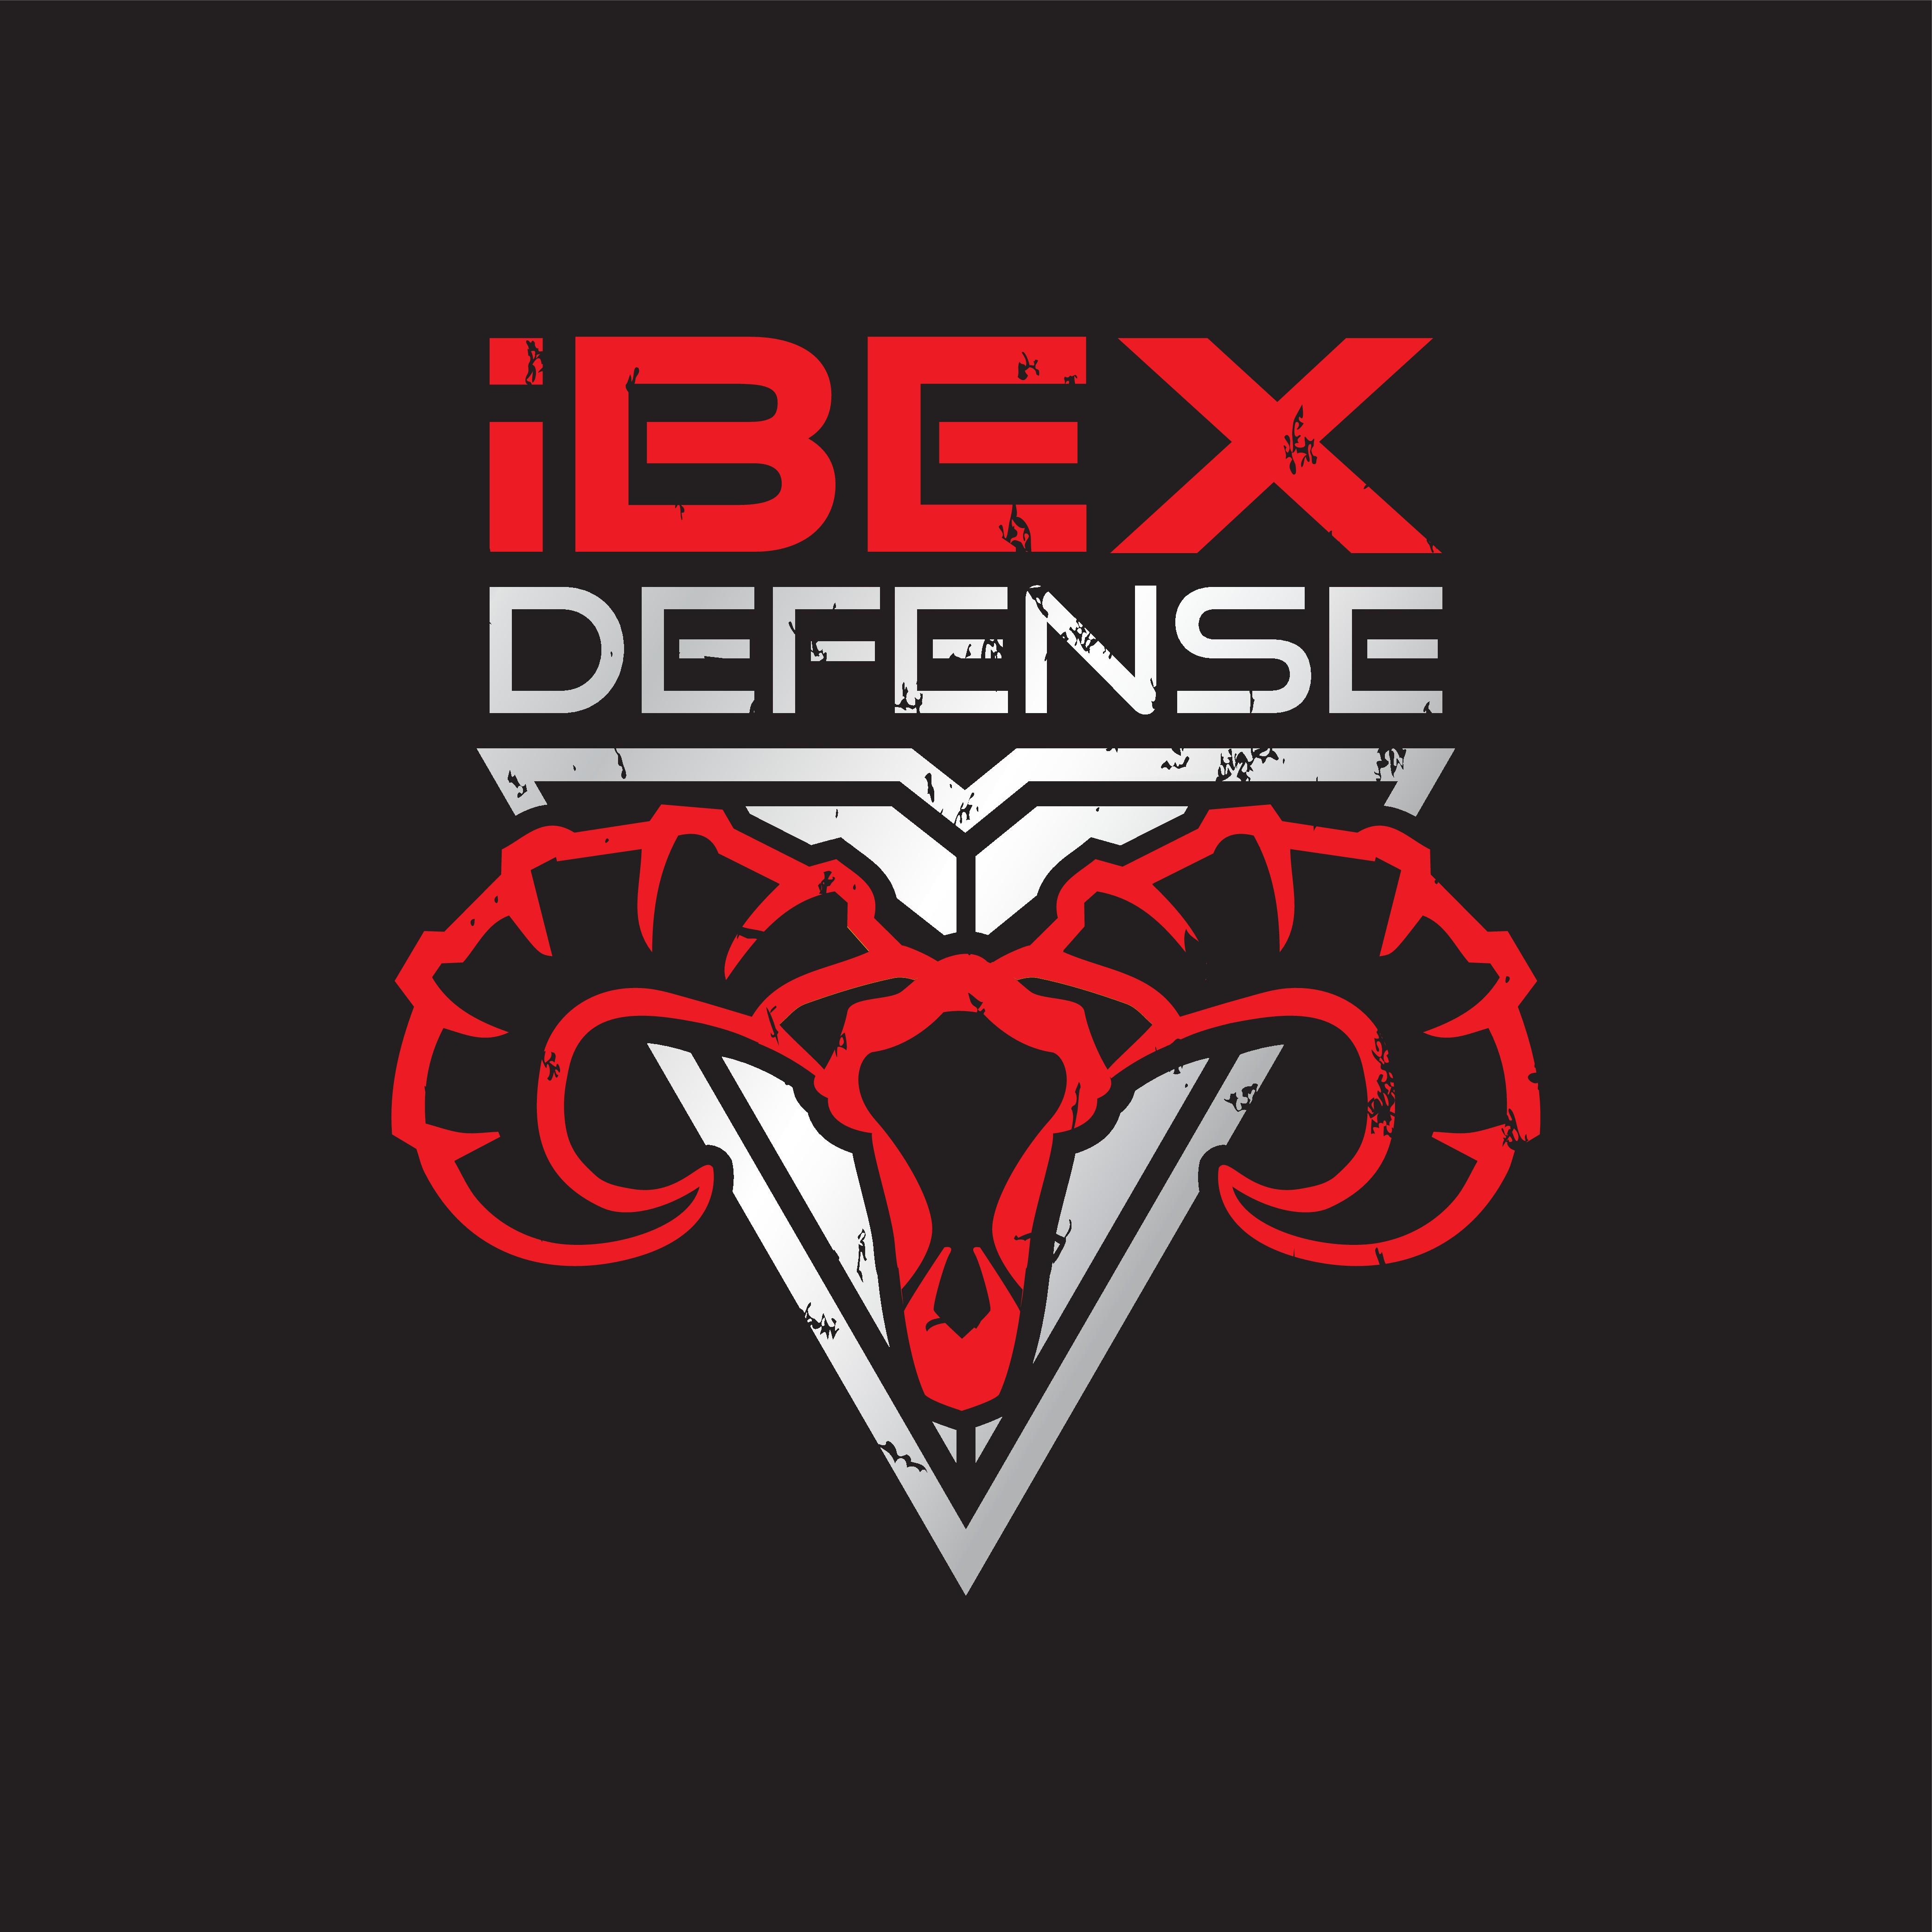 iBEX Defense company logo